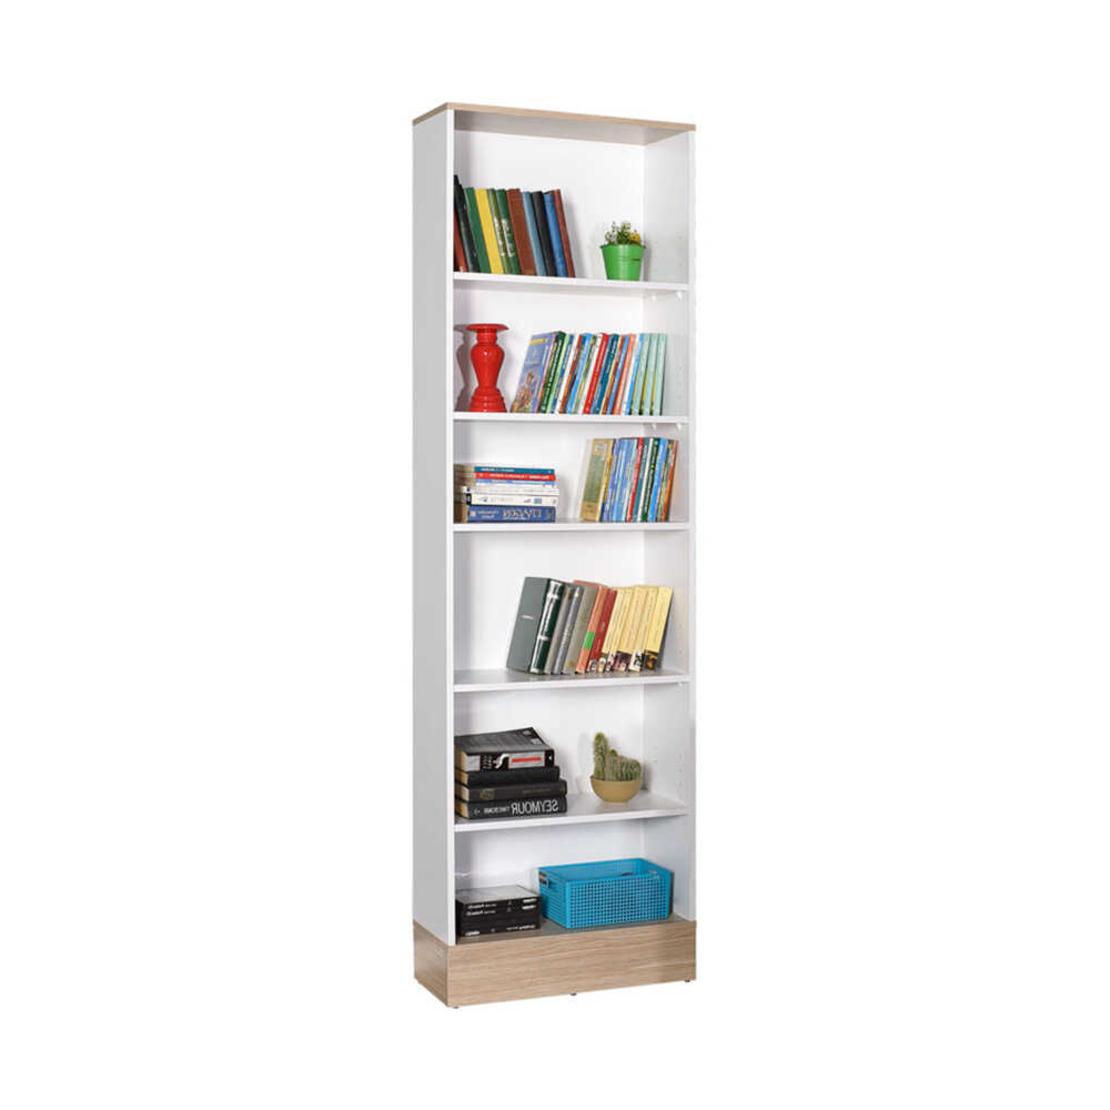 ספרייה סנדרה TP-860